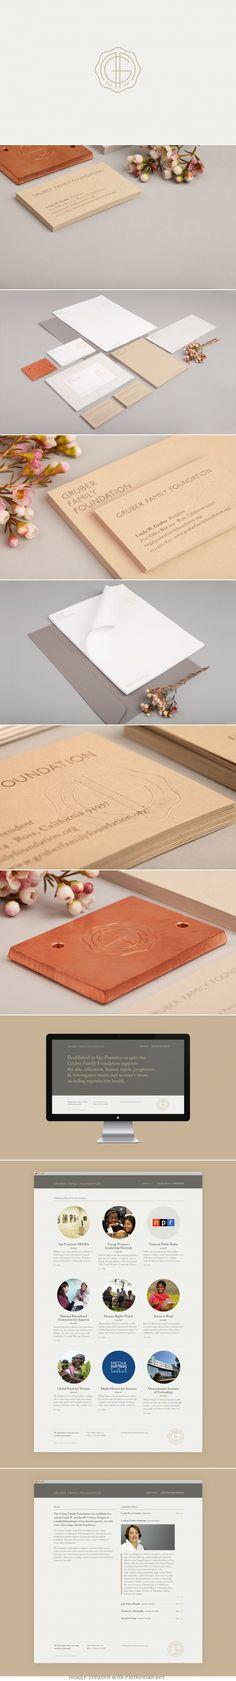 Corporate design letter head envelop business card cardboard eco logo branding letterpress embossed minimal website